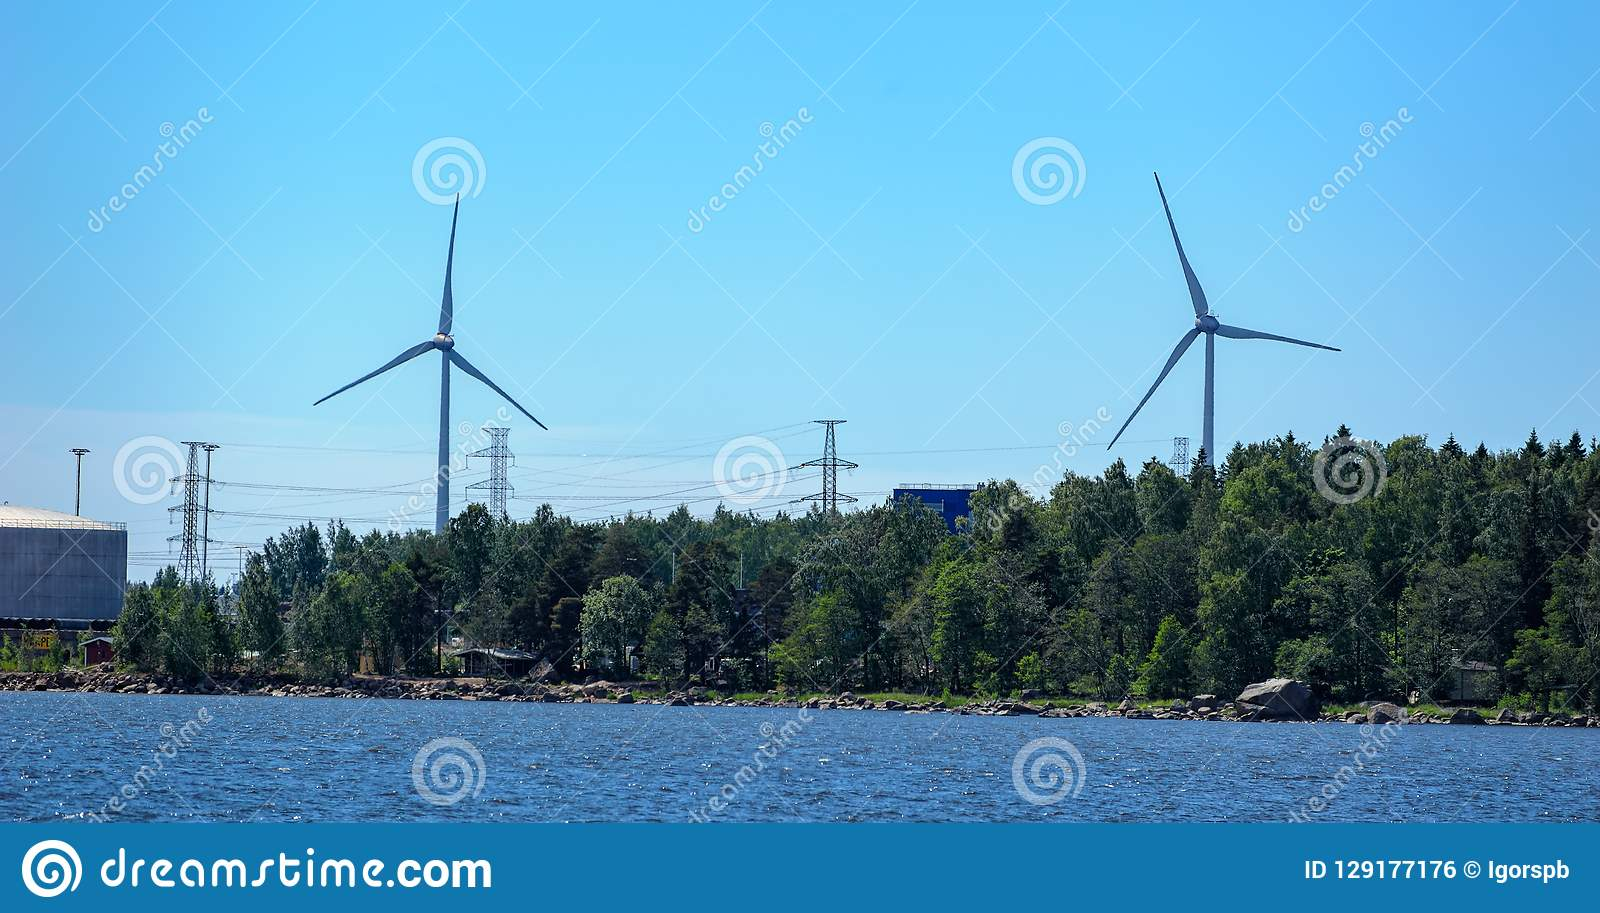 Industrial Coastal Landscape In Kotka, Finland  Stock Photo